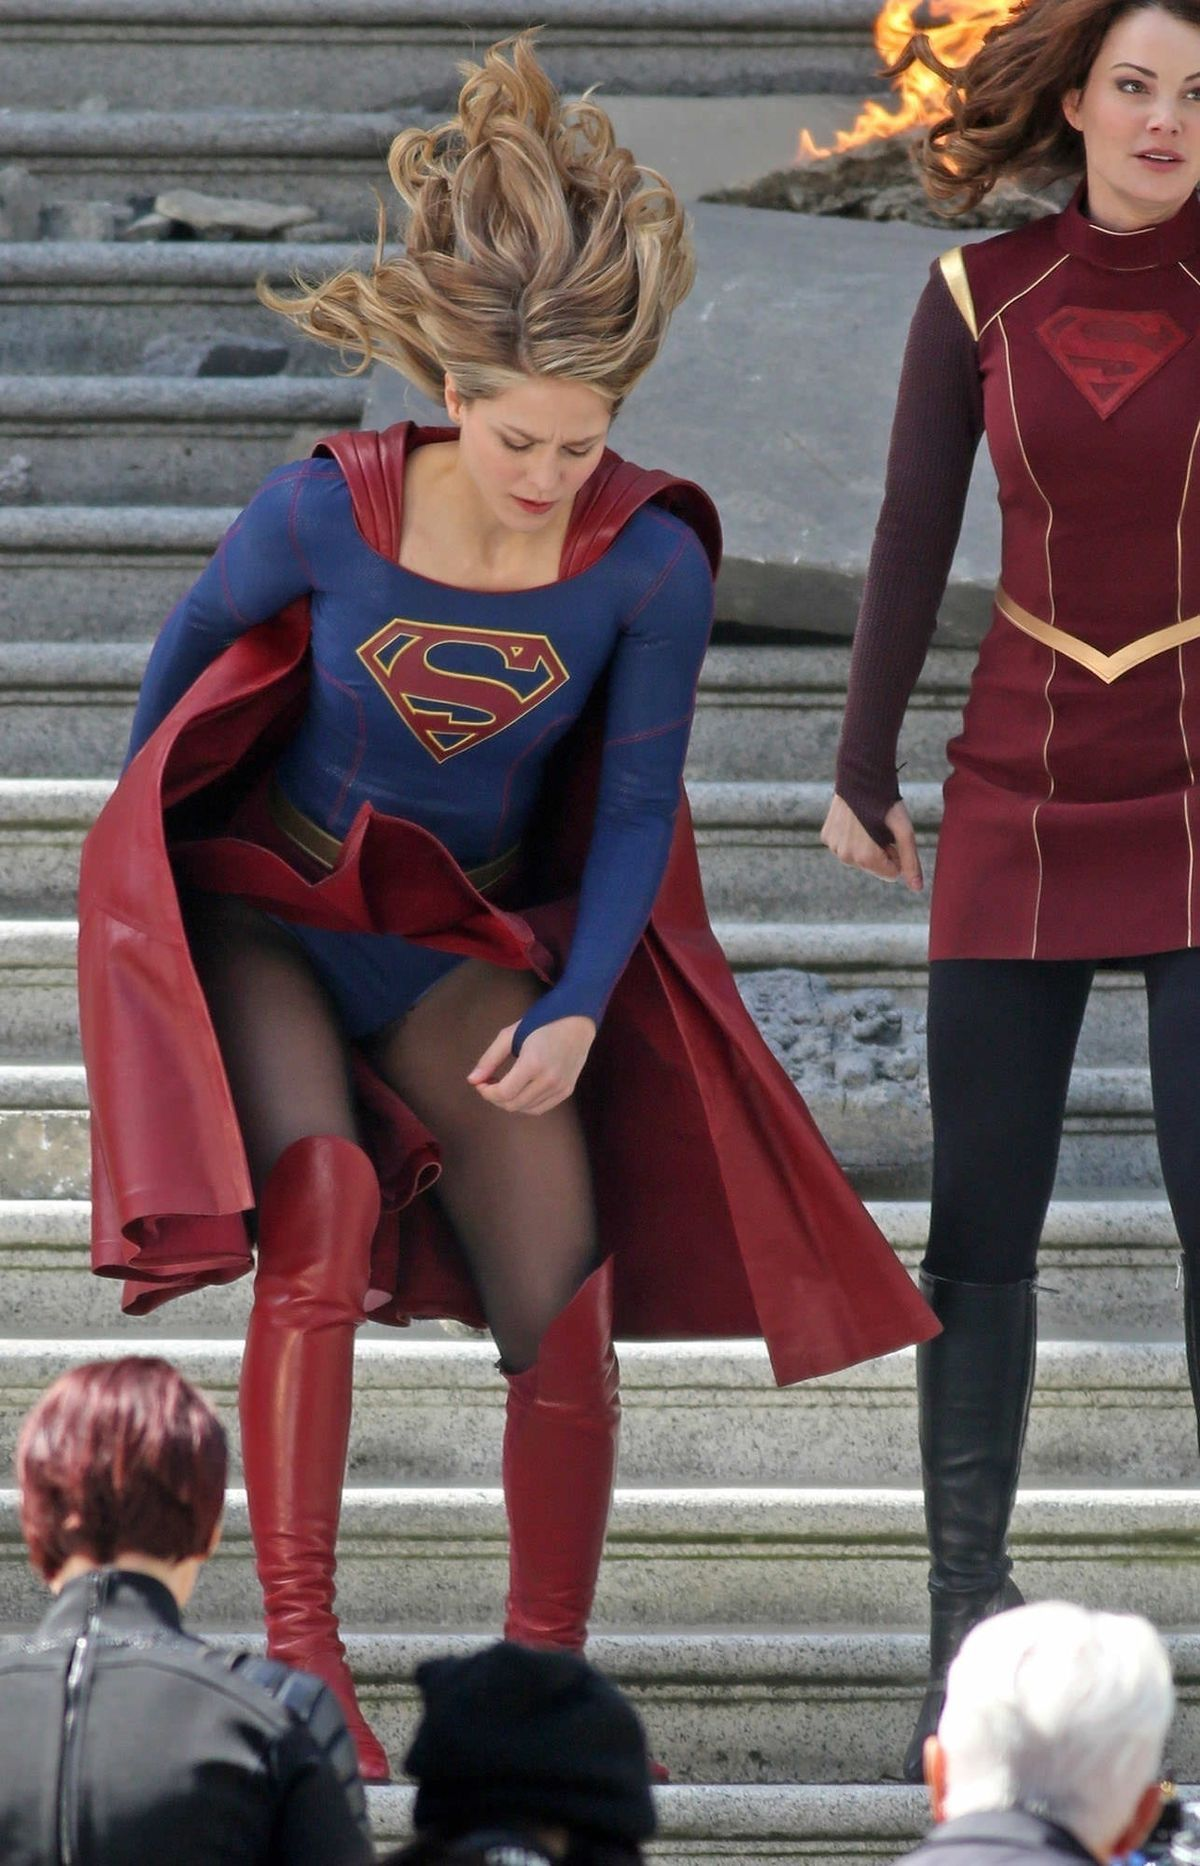 Superman Batman homo seksiä suku puoli balack